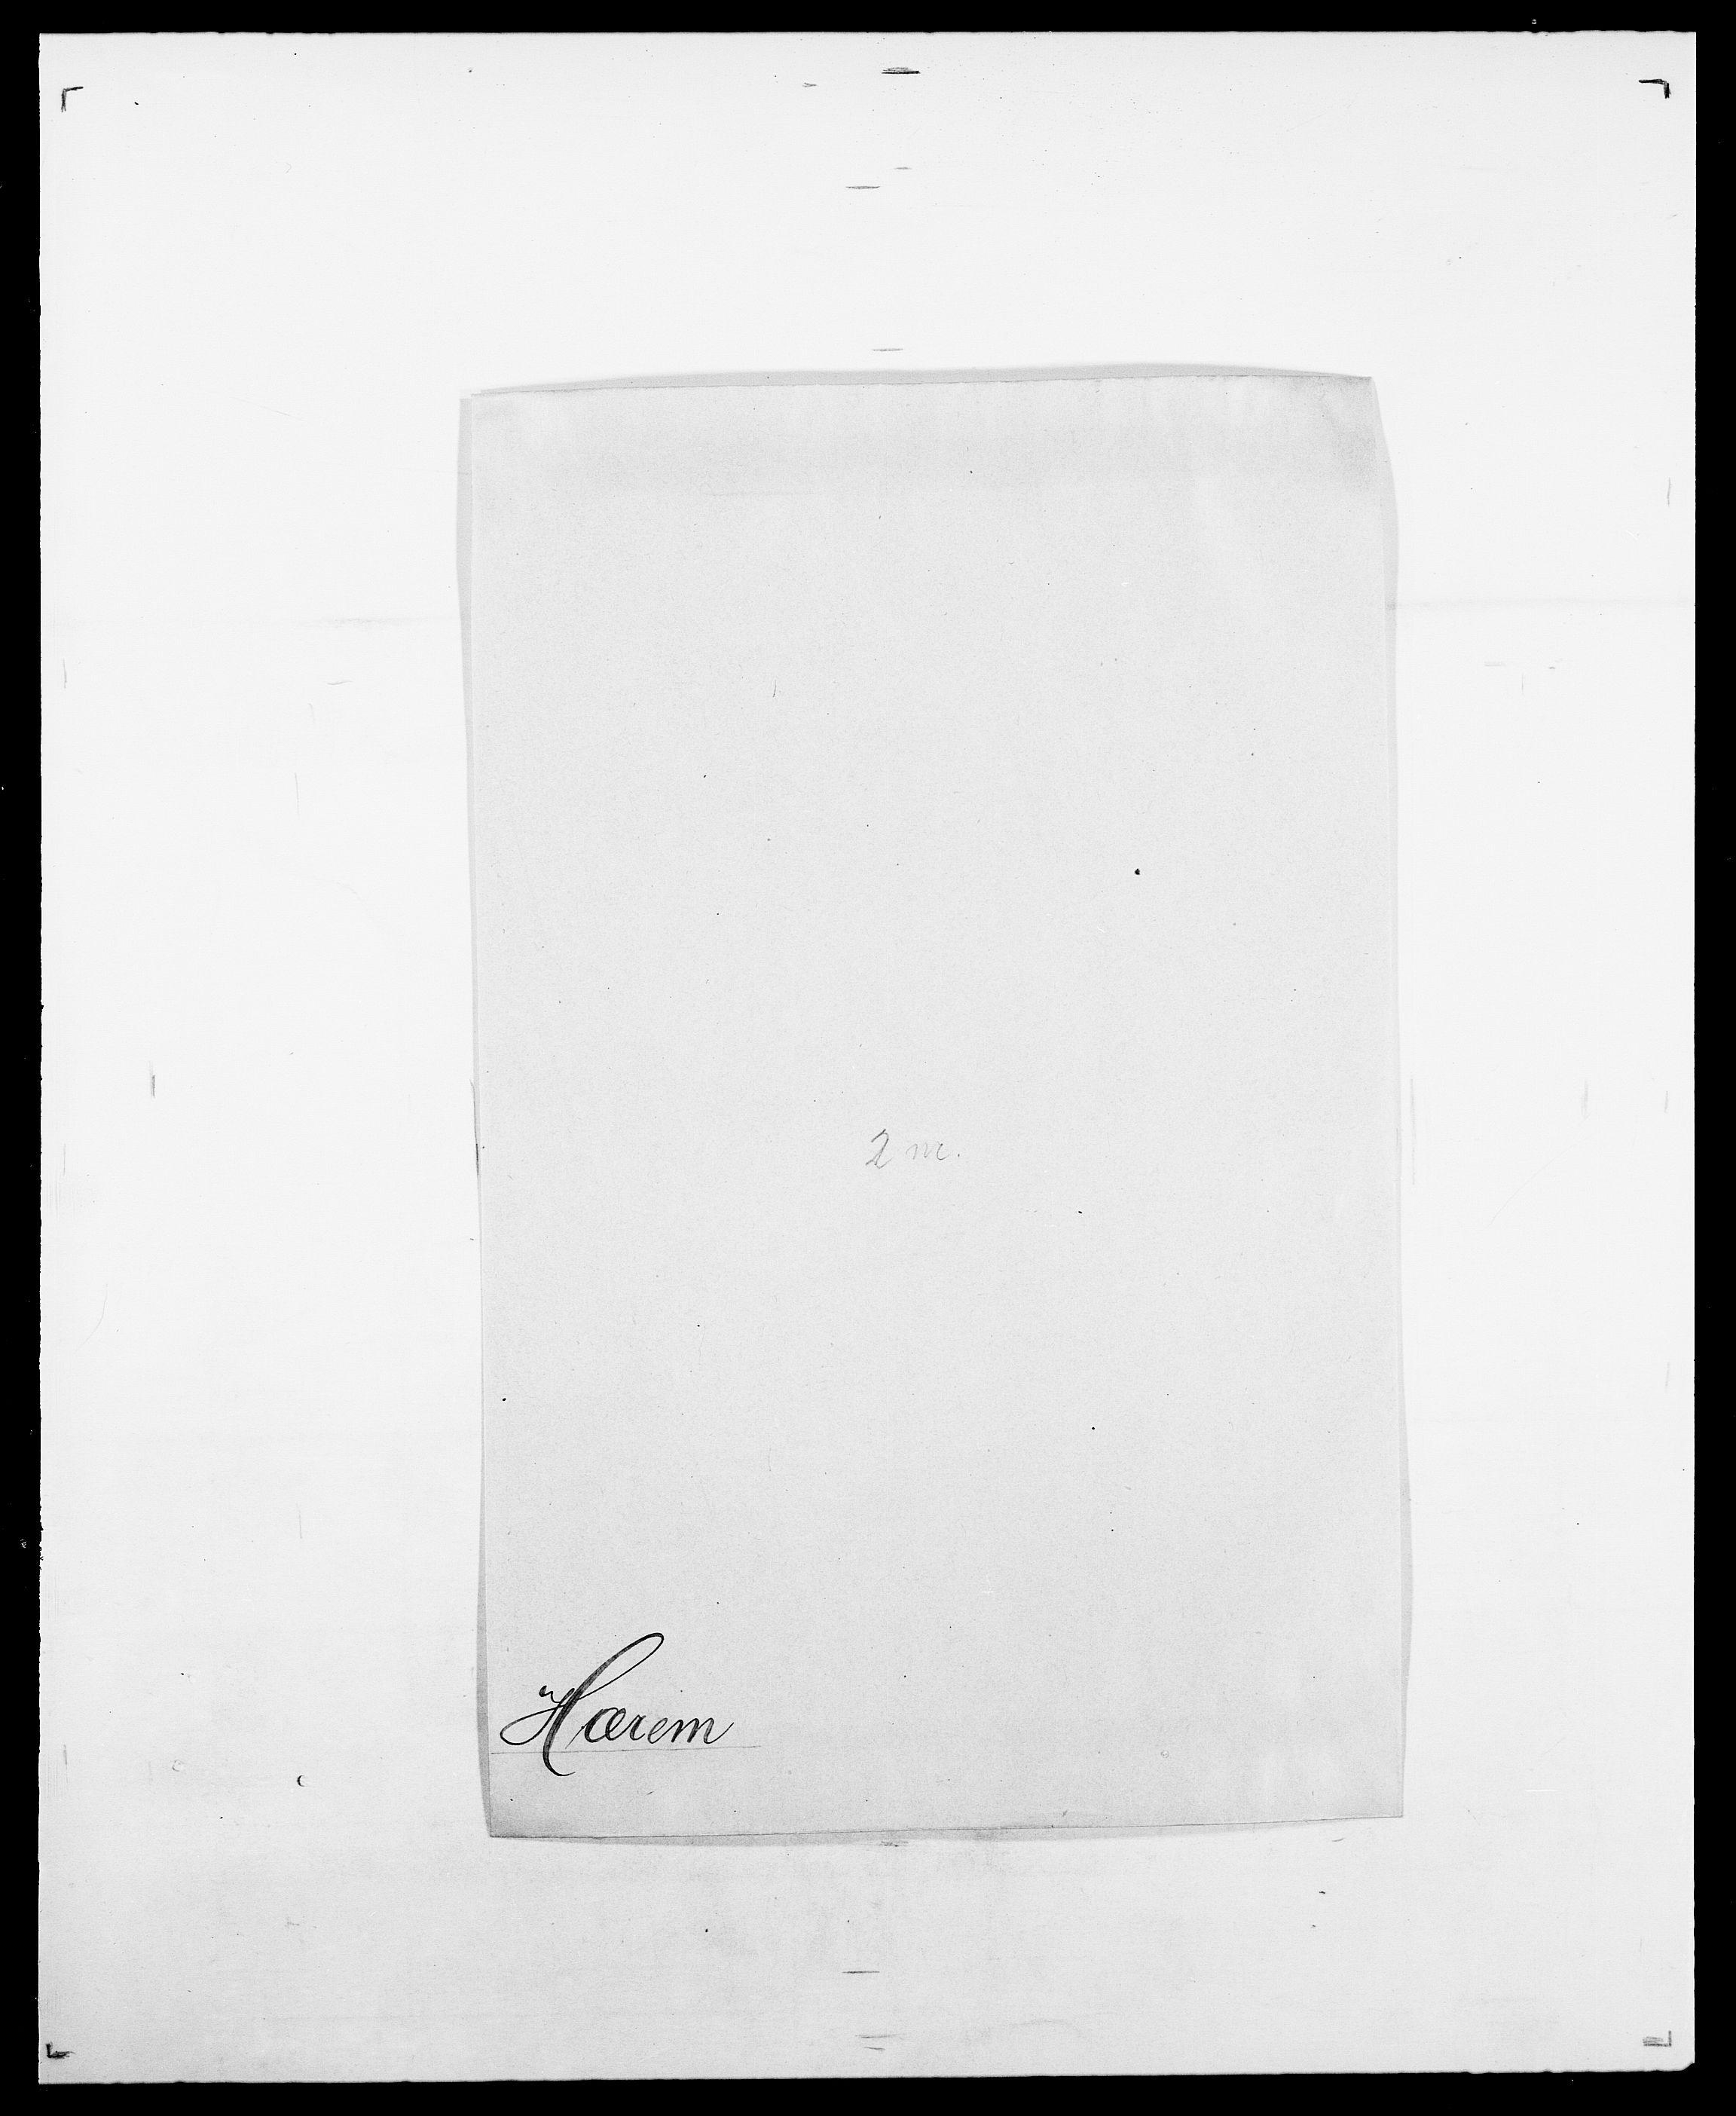 SAO, Delgobe, Charles Antoine - samling, D/Da/L0019: van der Hude - Joys, s. 307